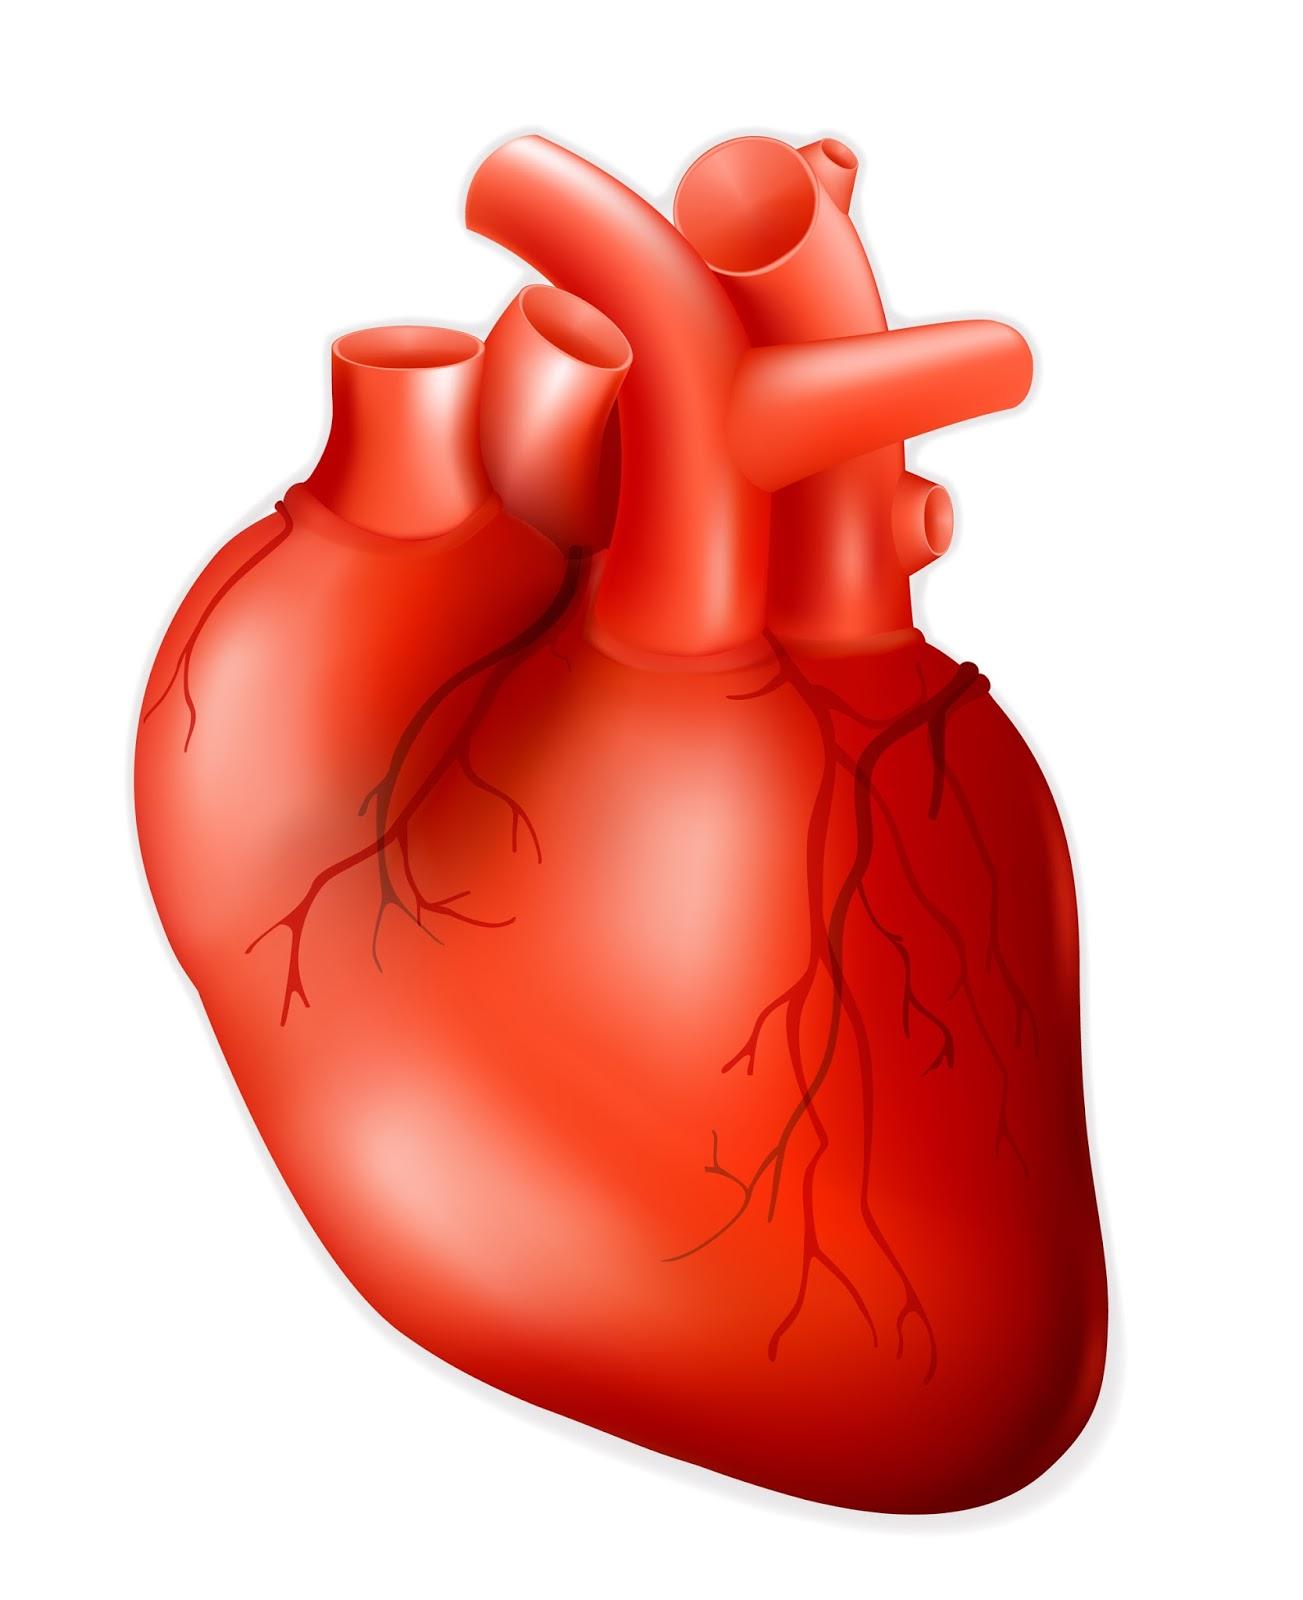 Human heart cliparts clip freeuse stock Human heart real heart clipart kid - ClipartBarn clip freeuse stock